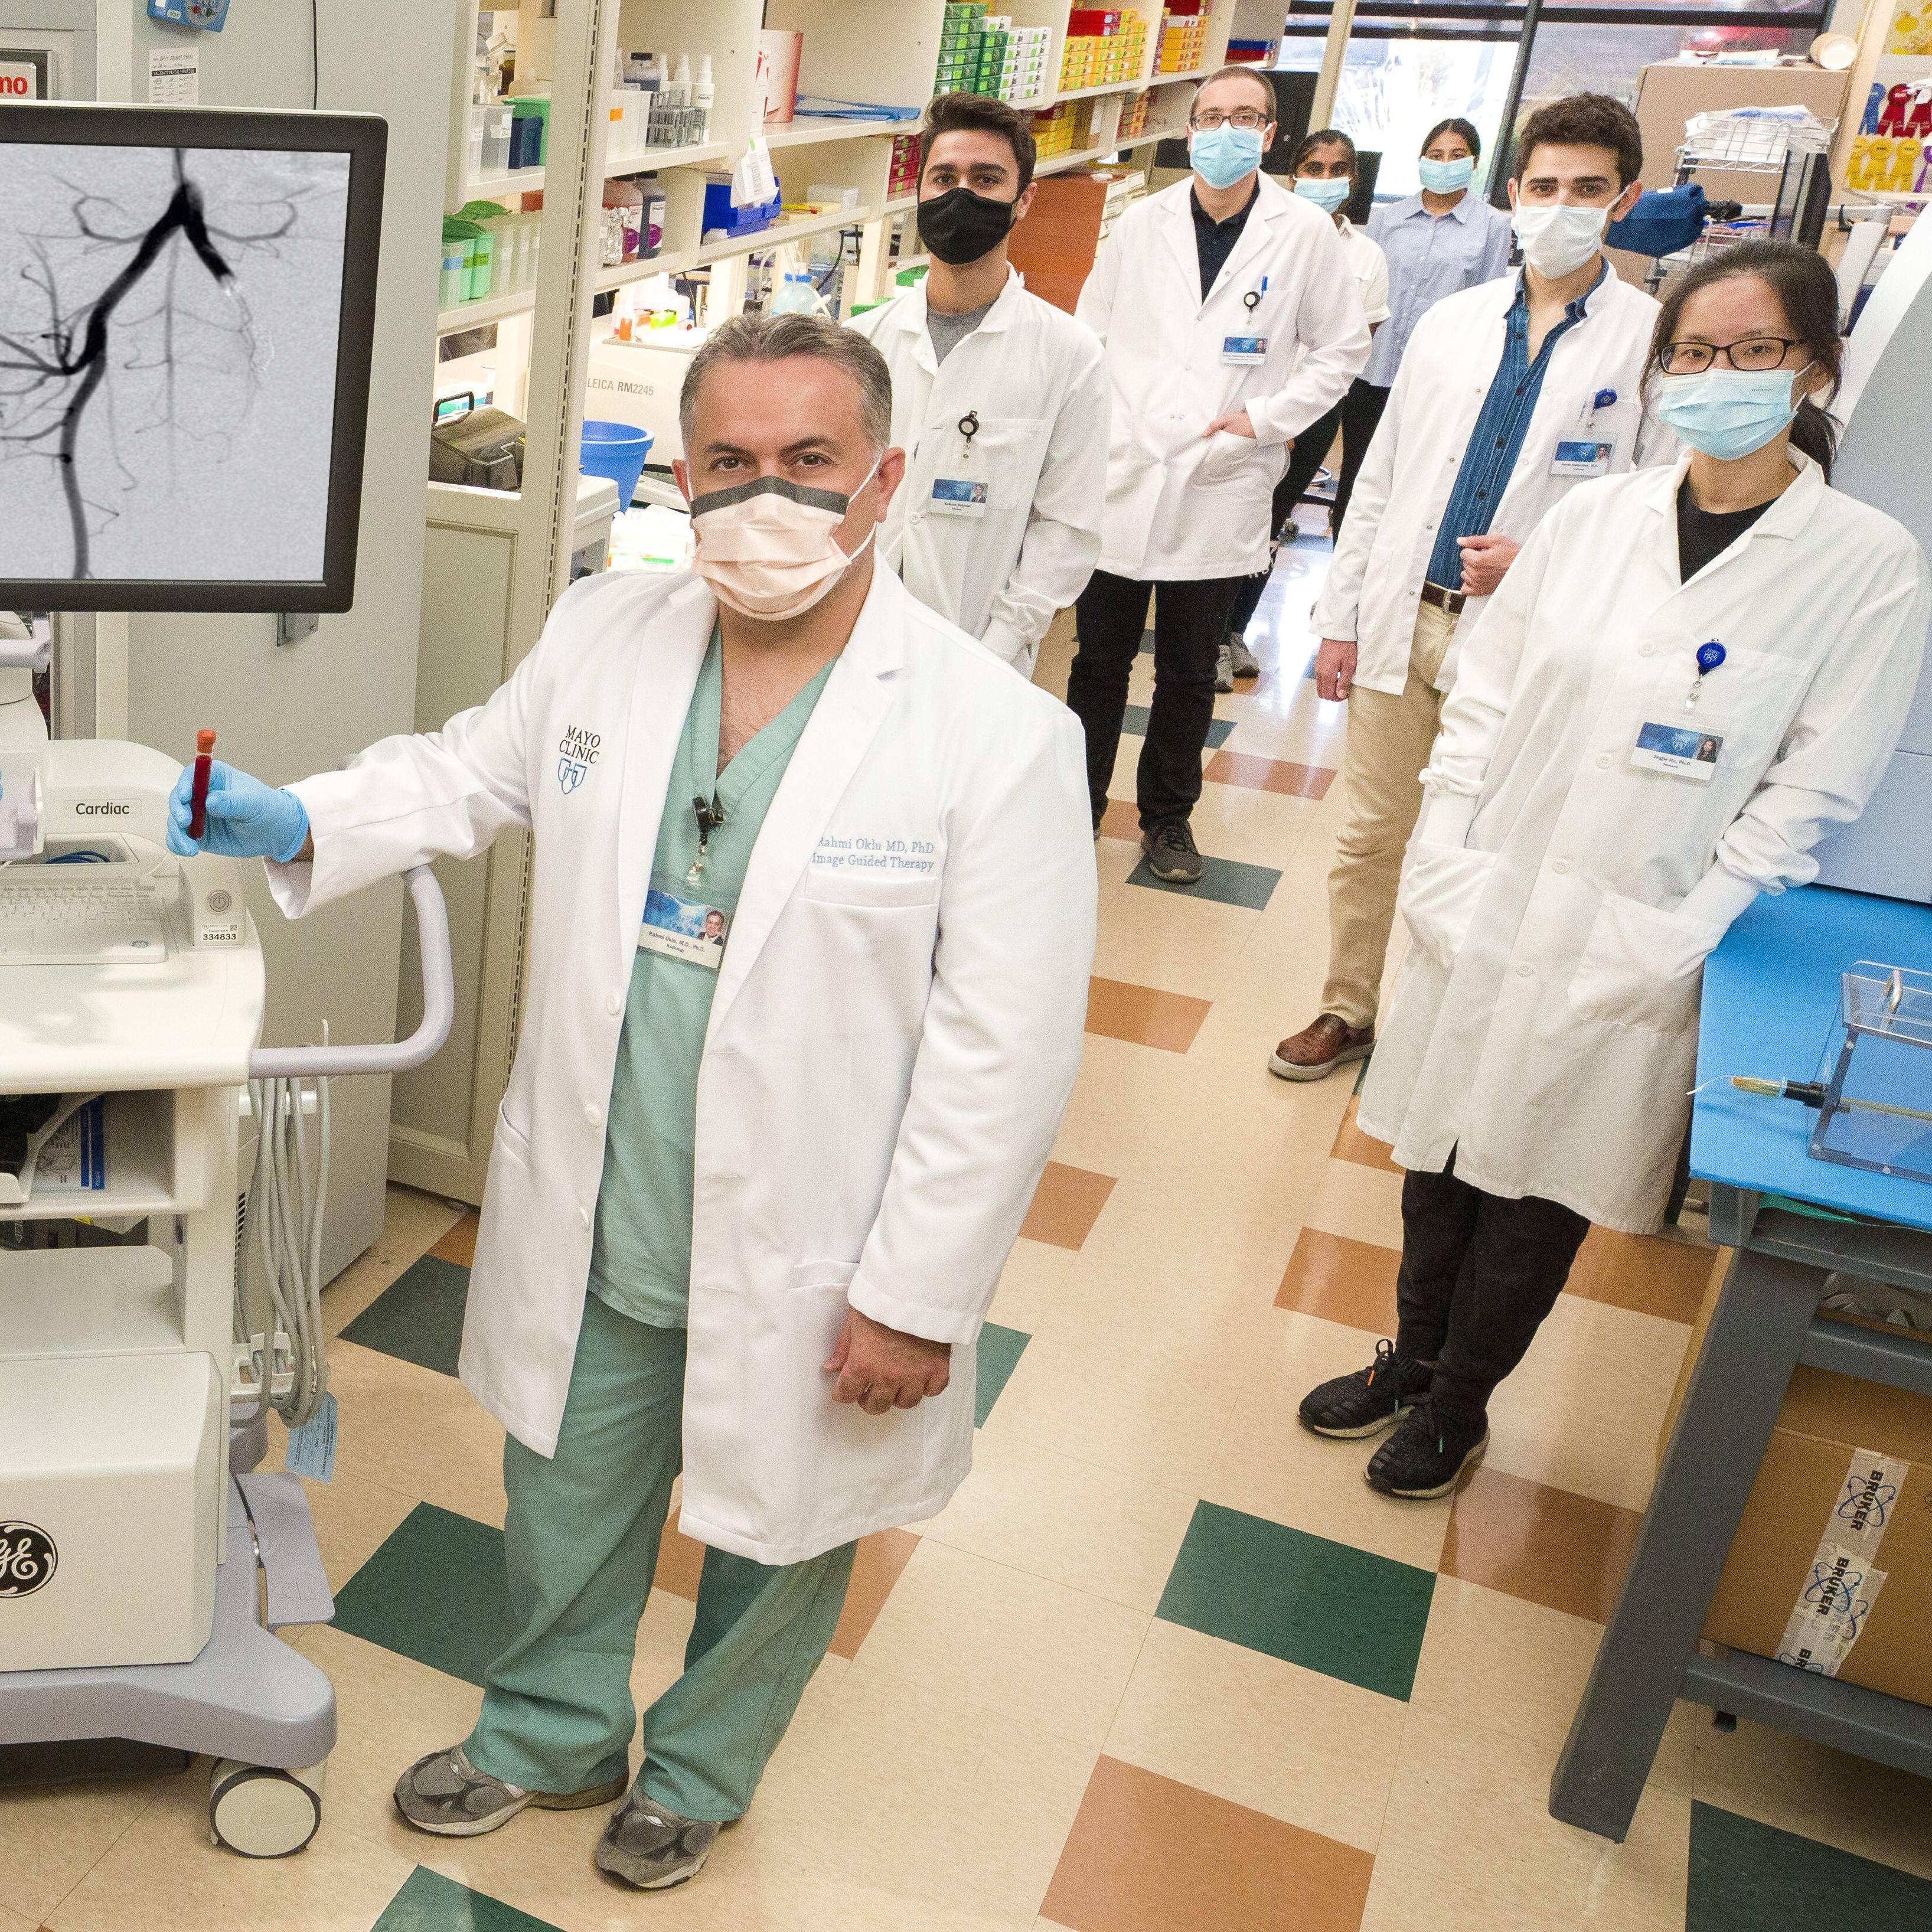 Dr. Rahmi Oklu and the Minimally Invasive Therapeutics Laboratory team at Mayo Clinic in Arizona